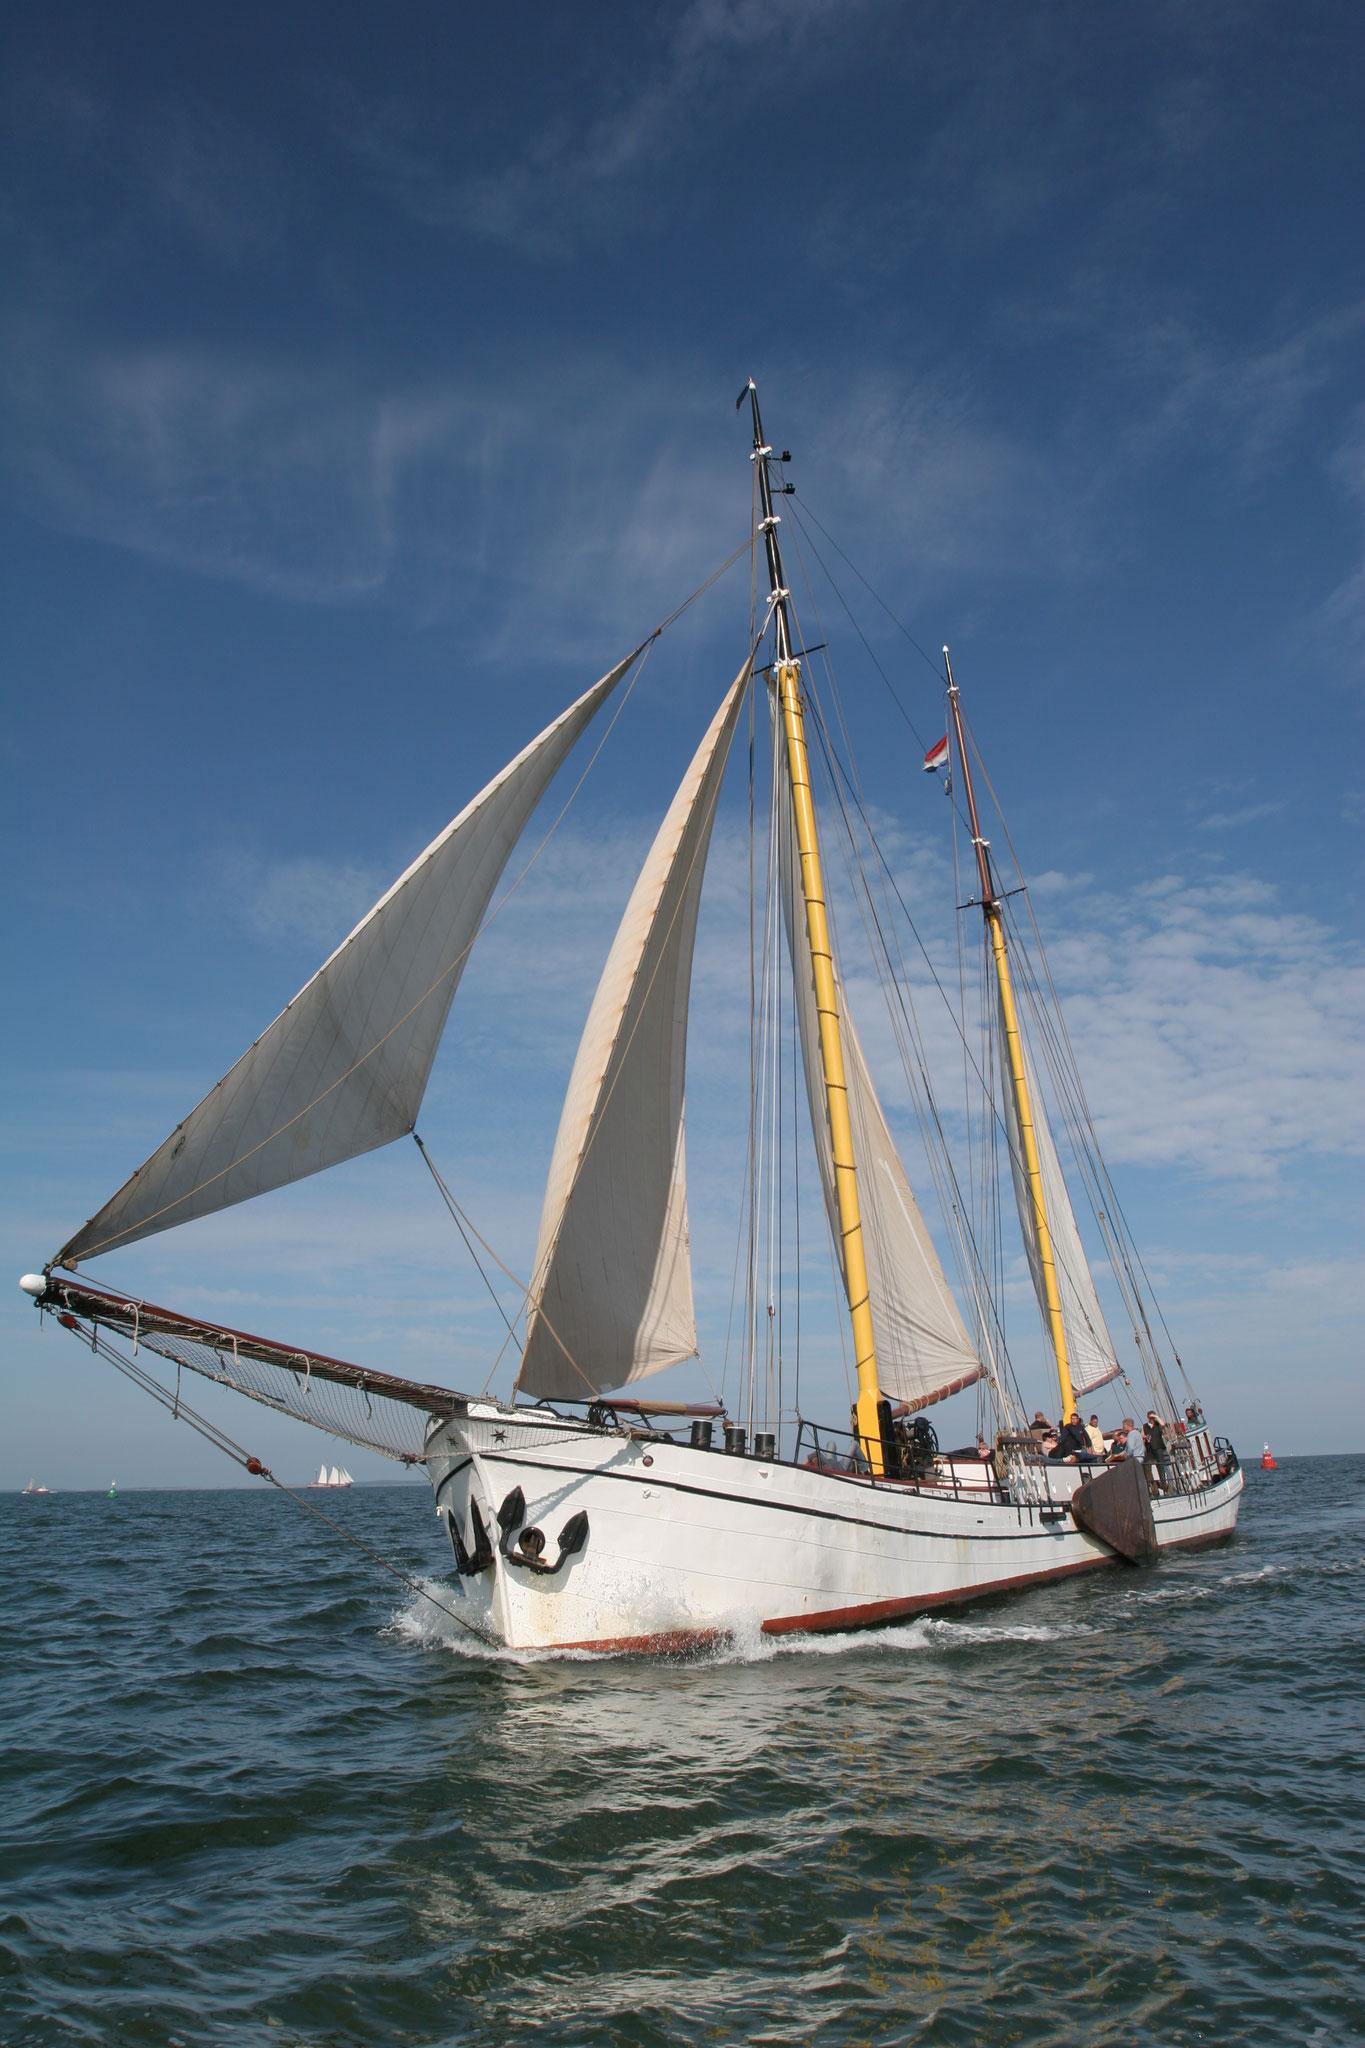 Segelschiff Actief unter Segeln